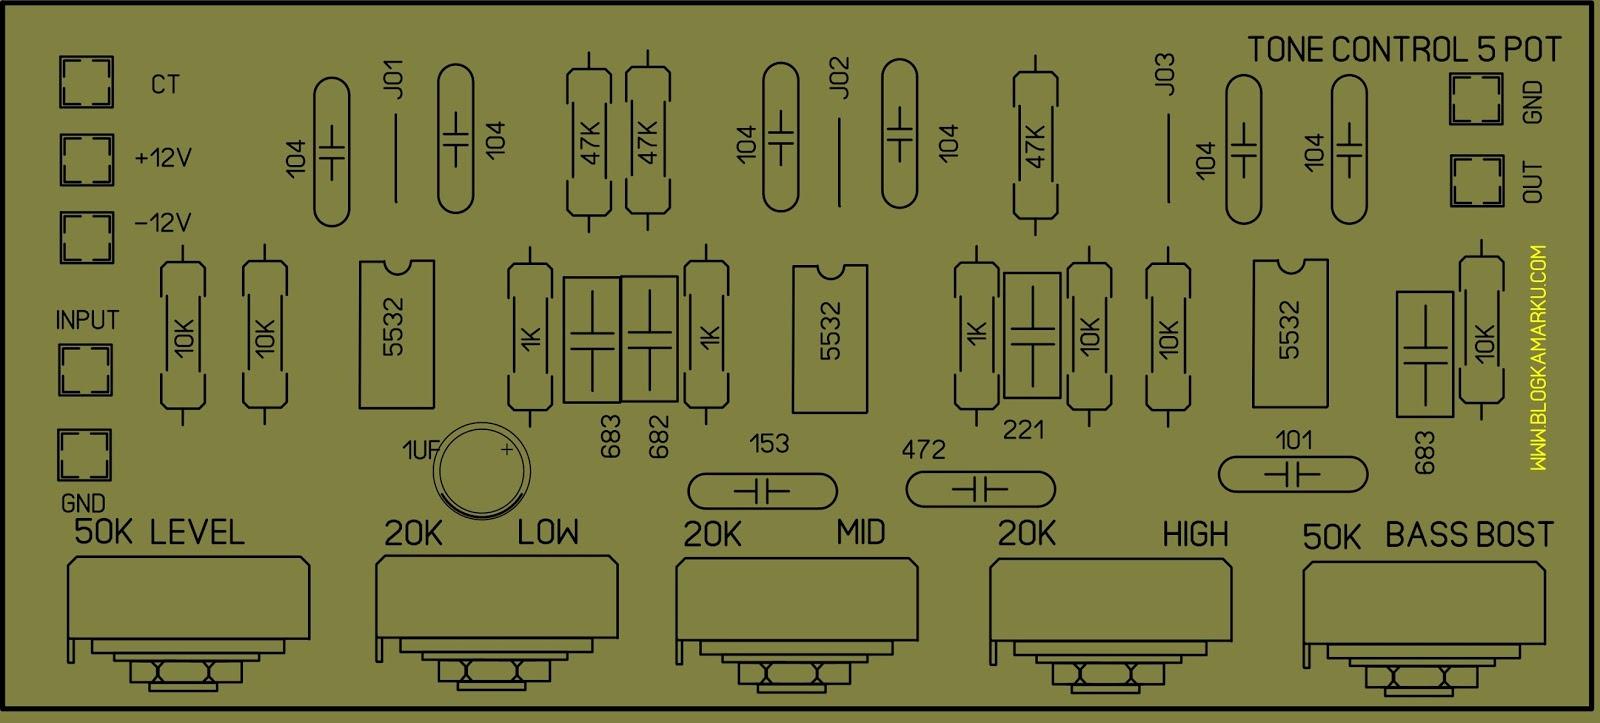 Pcb Layout Namec Tone Control Mono Modifikasi Dan Assesoris Tonecontrol 5 Potensio Dengan Bass Bost